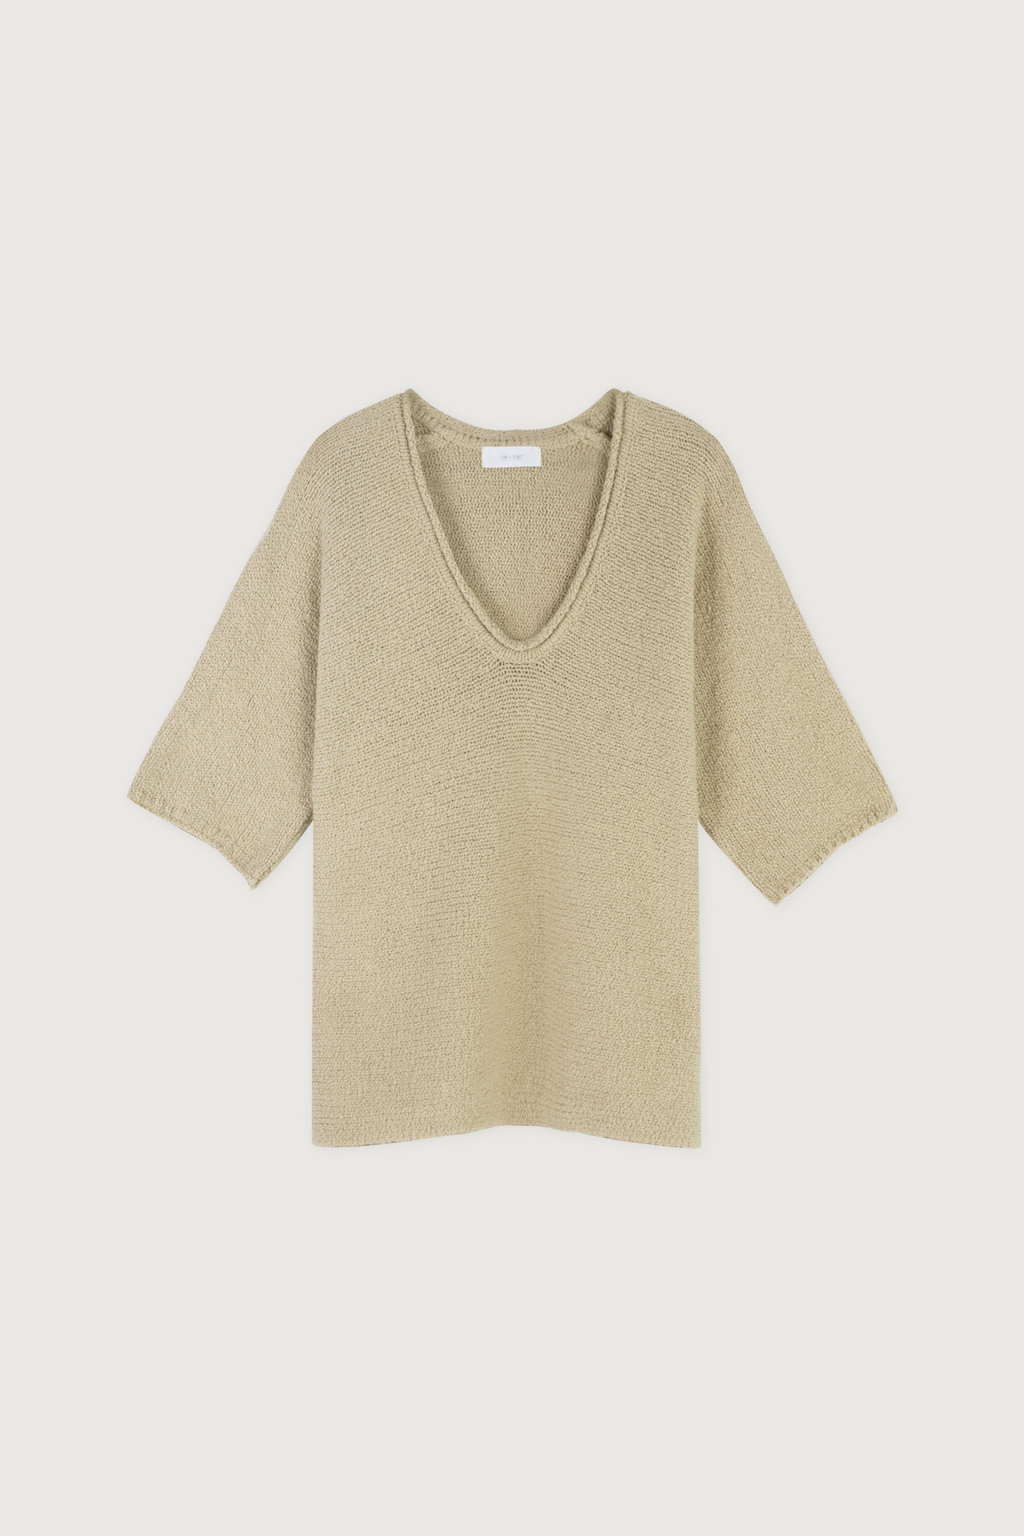 Sweater 3396 Sage 12